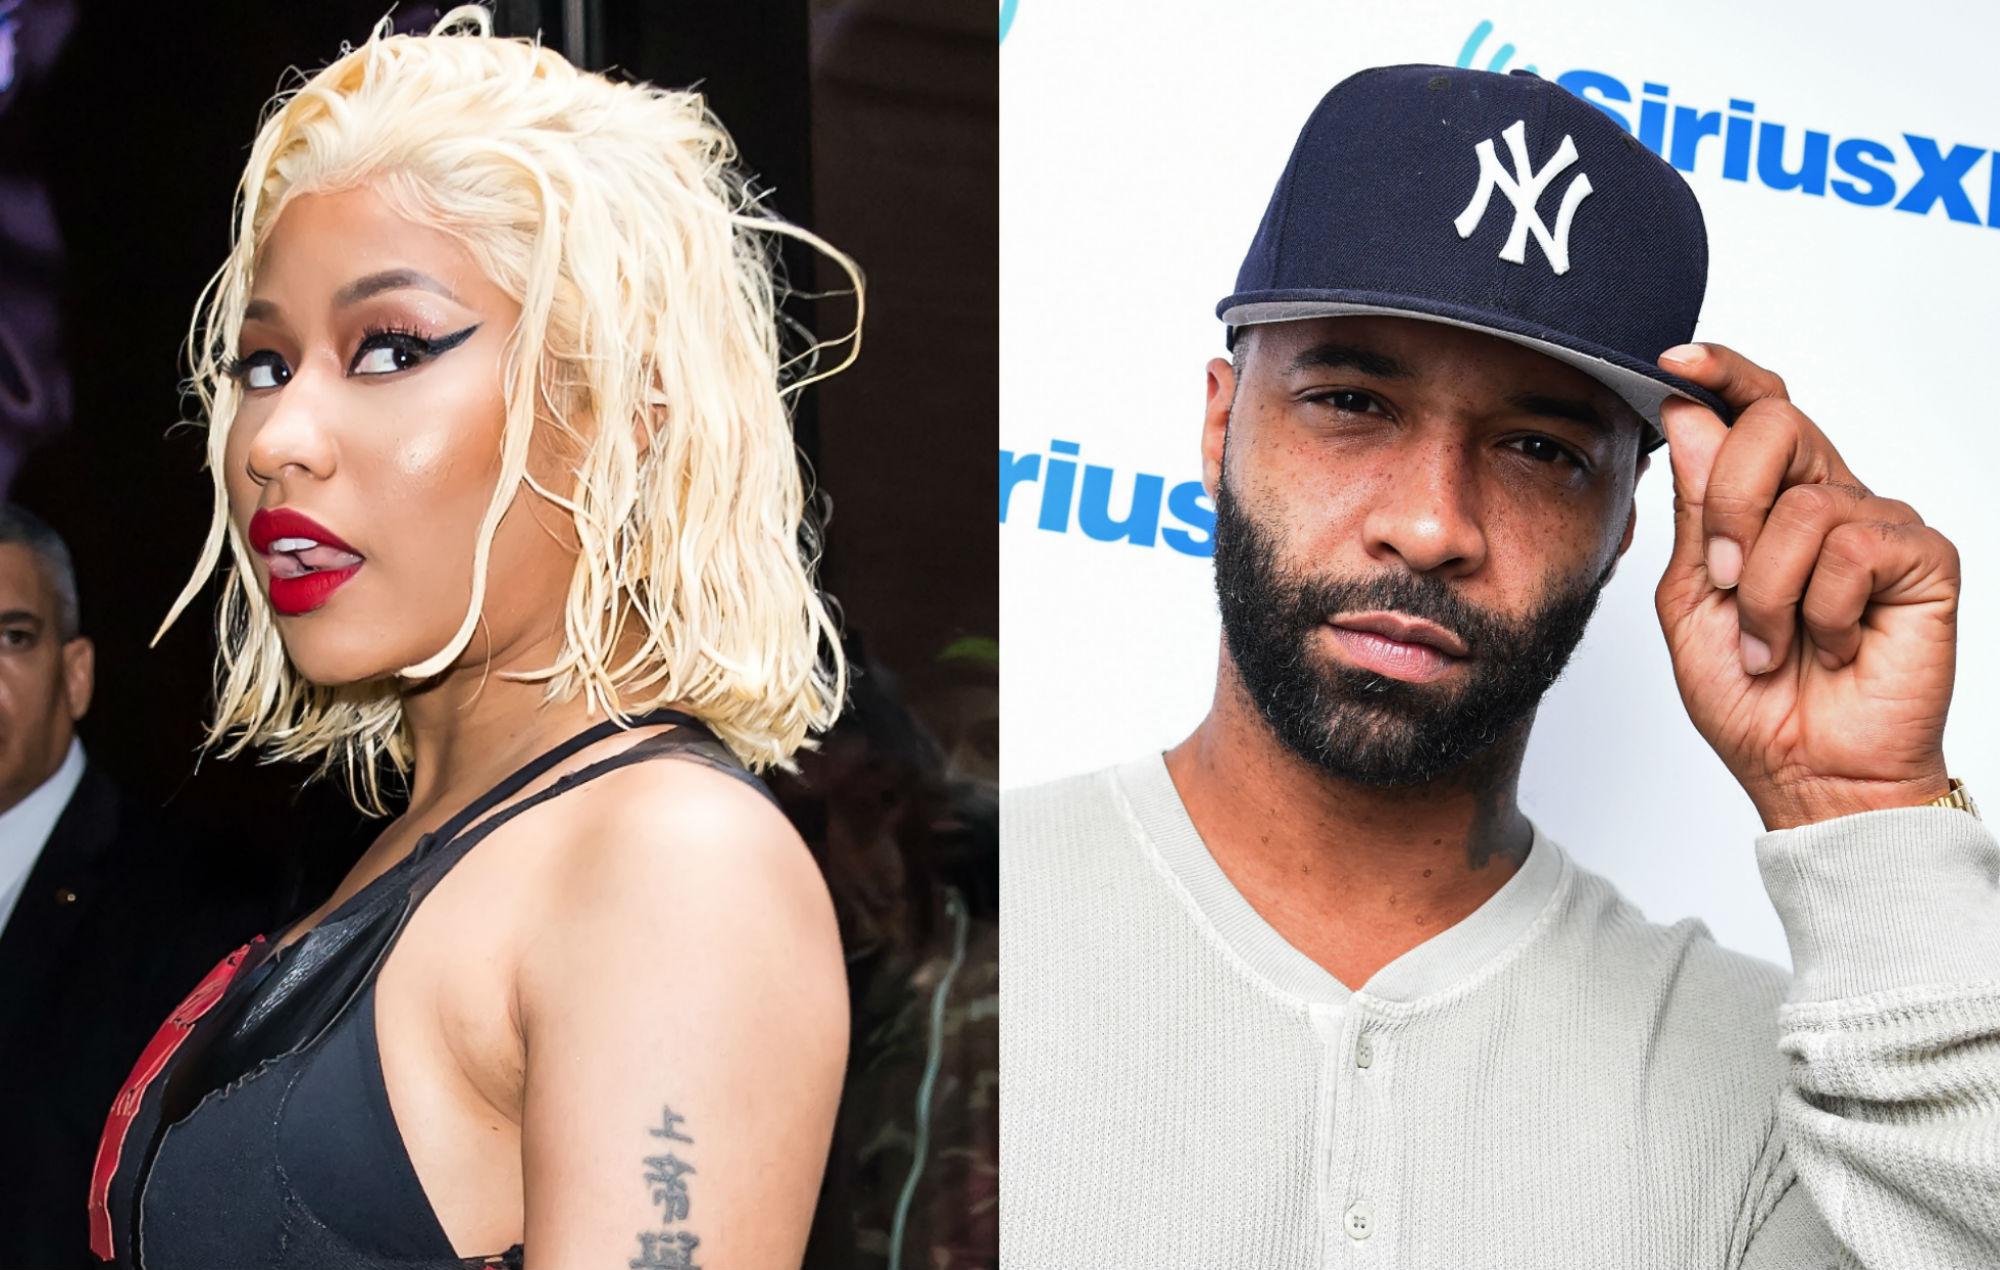 Nicki Minaj kicks Joe Budden off her 'QUEEN RADIO' show